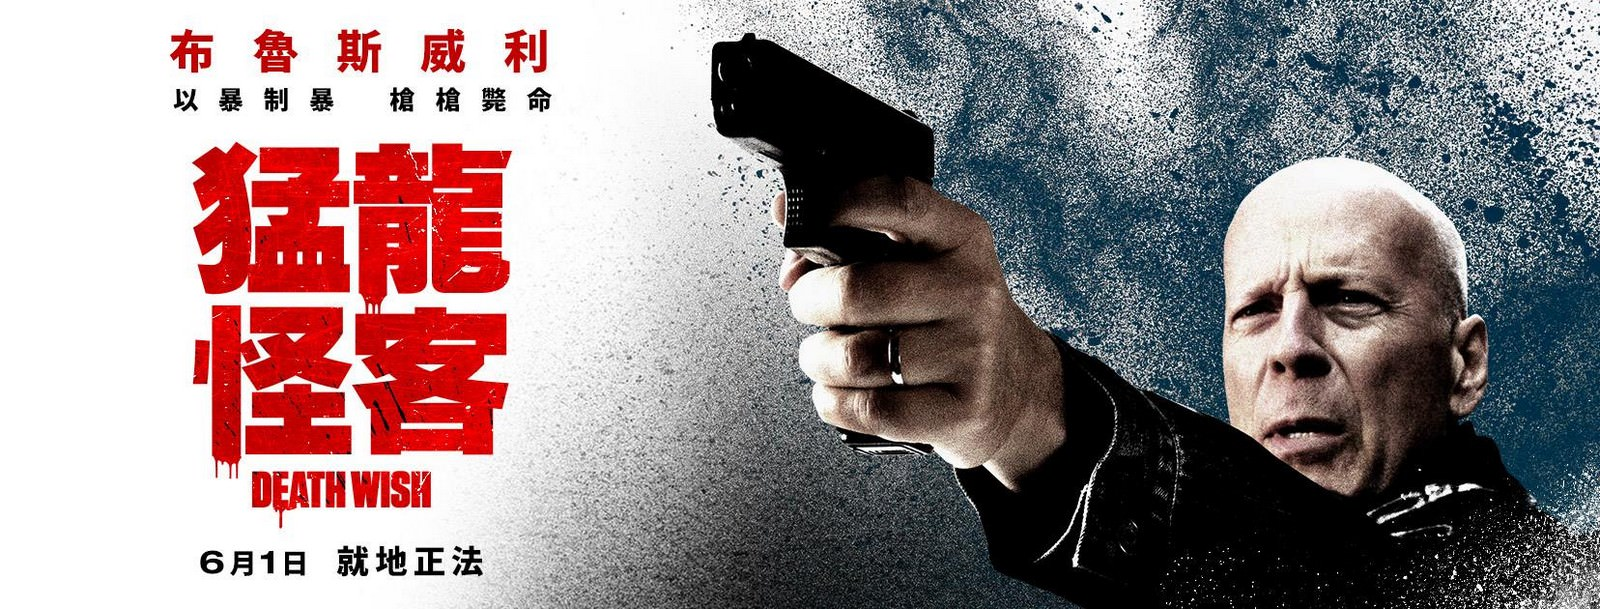 Movie, Death Wish(美國) / 猛龍怪客(台) / 虎膽追兇(港), 電影海報, 台灣, 橫版